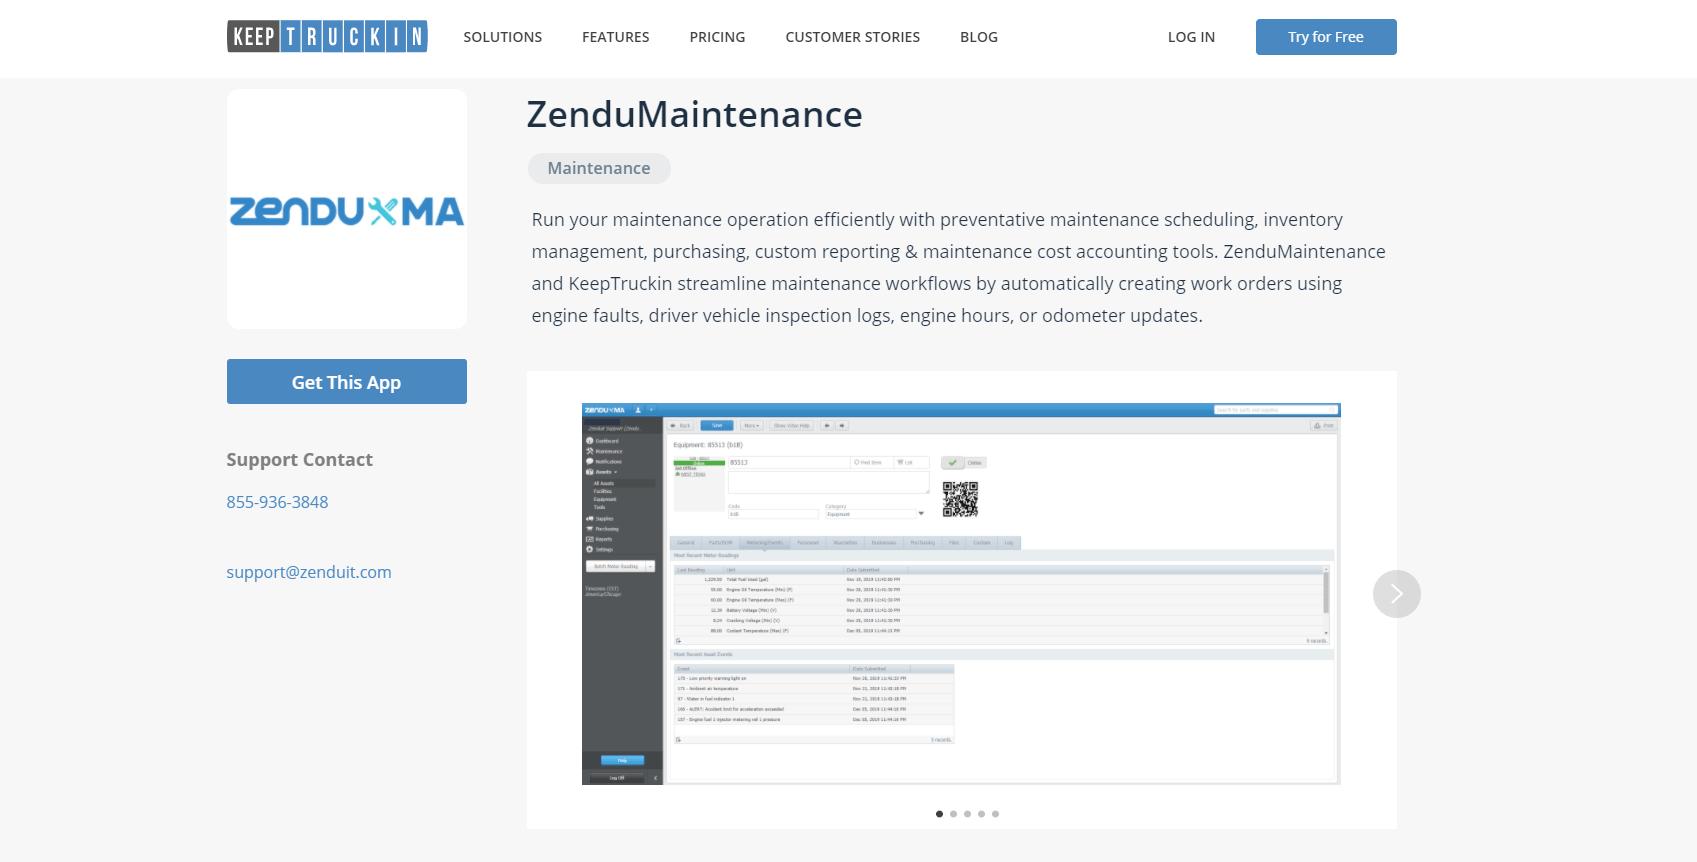 zenduma, zendumaintenance, keeptruckin, marketplace, app, marketplaces